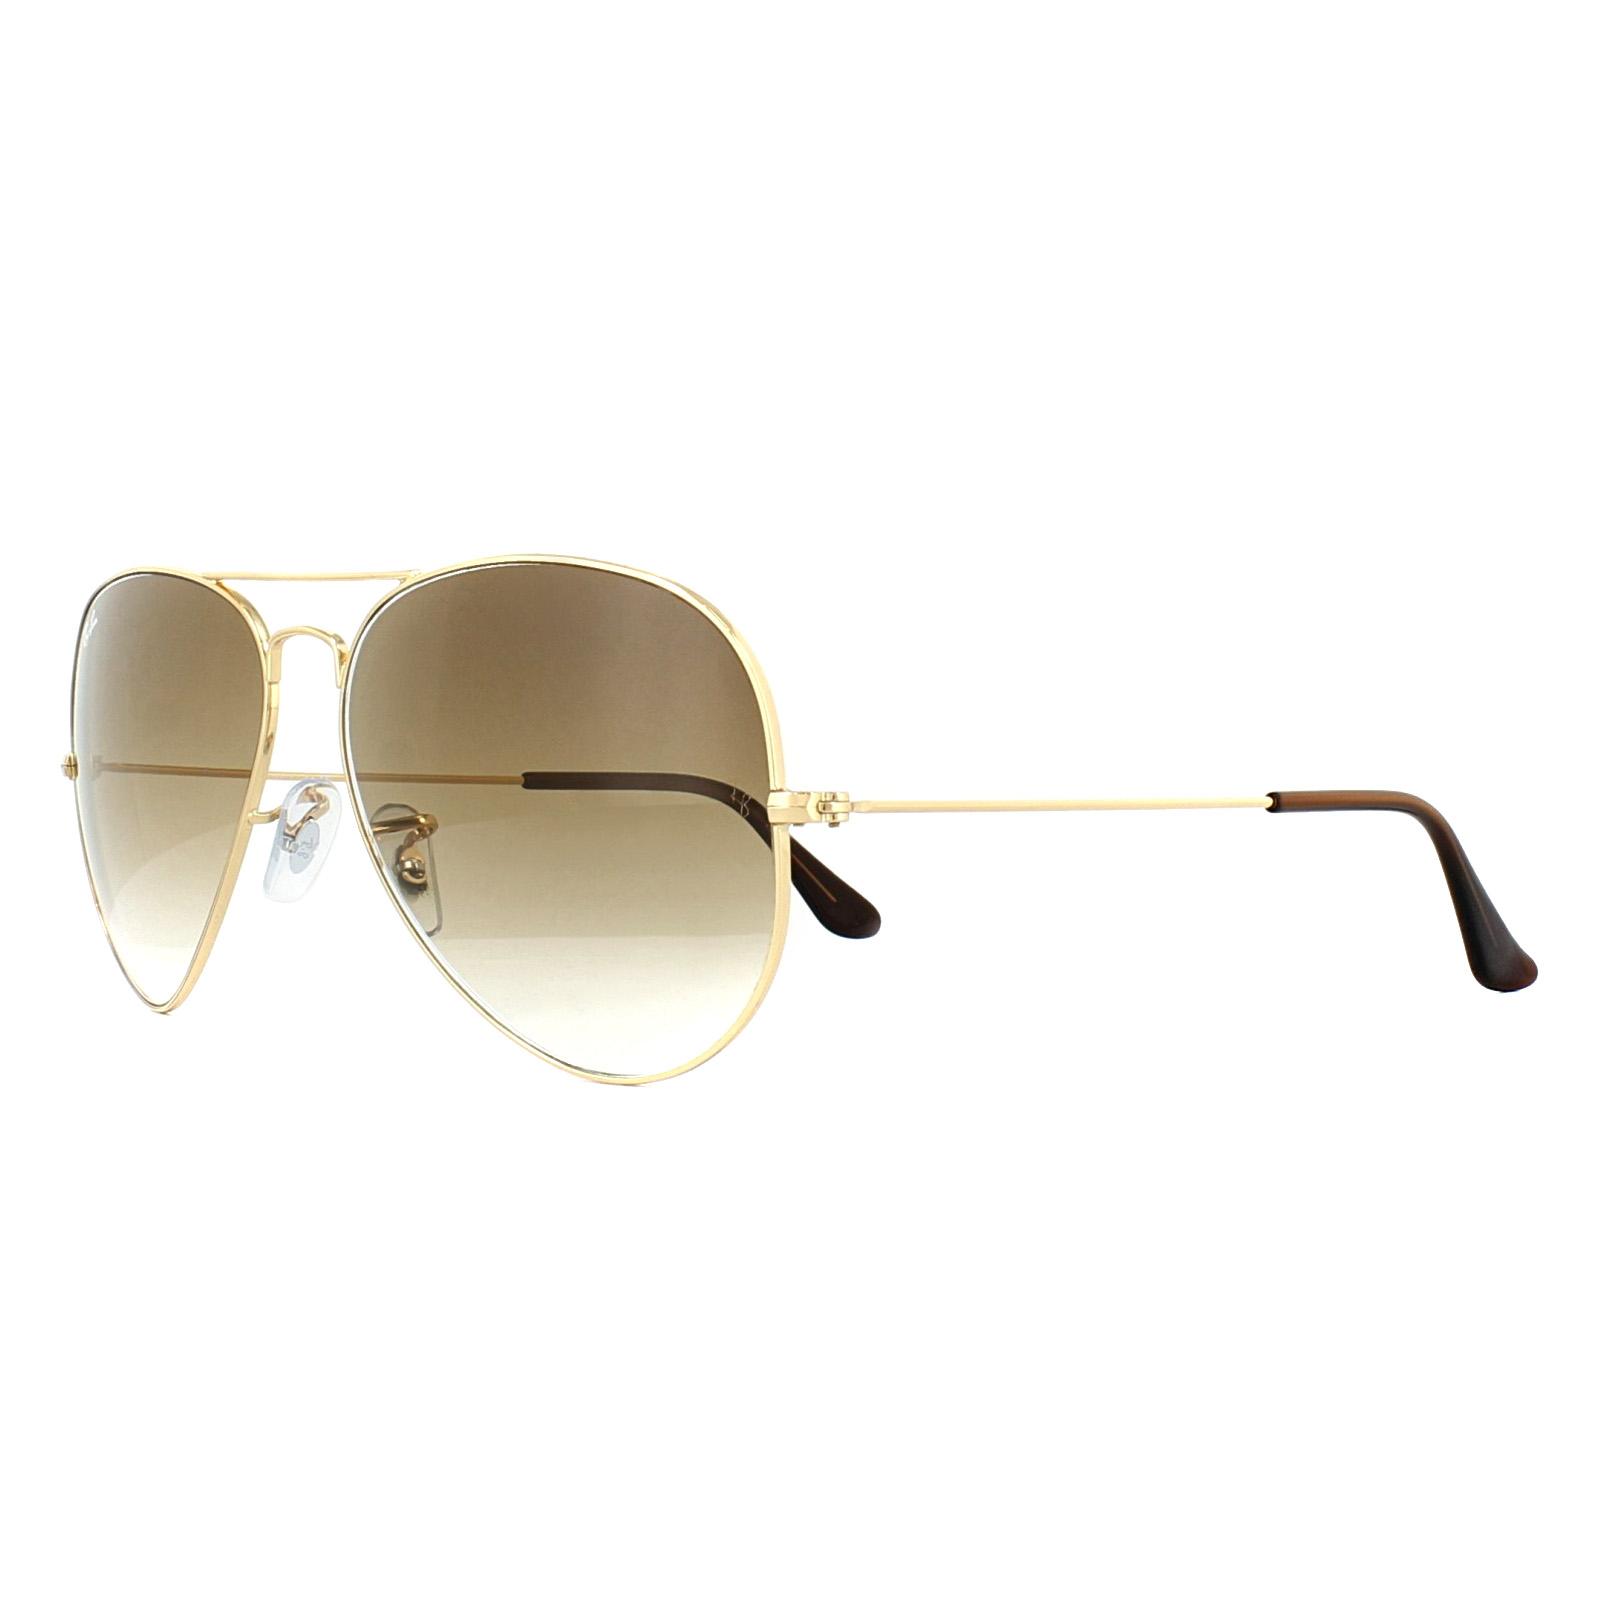 125684f87b8 Sentinel Ray-Ban Sunglasses Aviator 3025 Gold Brown Gradient 001 51 Large  62mm